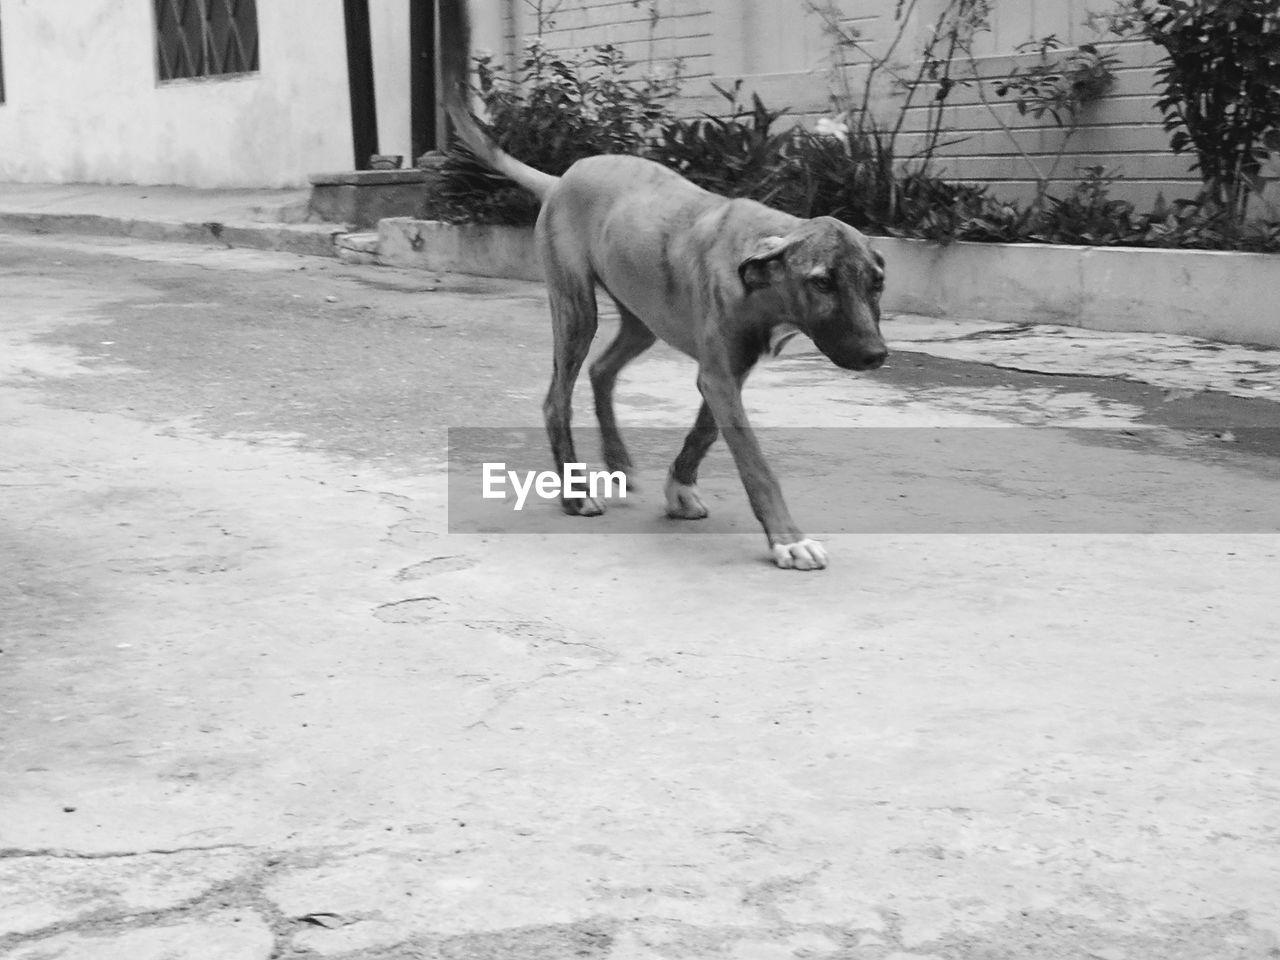 Dog Animal Pets One Animal Domestic Animals Outdoors Animal Themes Day Pet Portraits